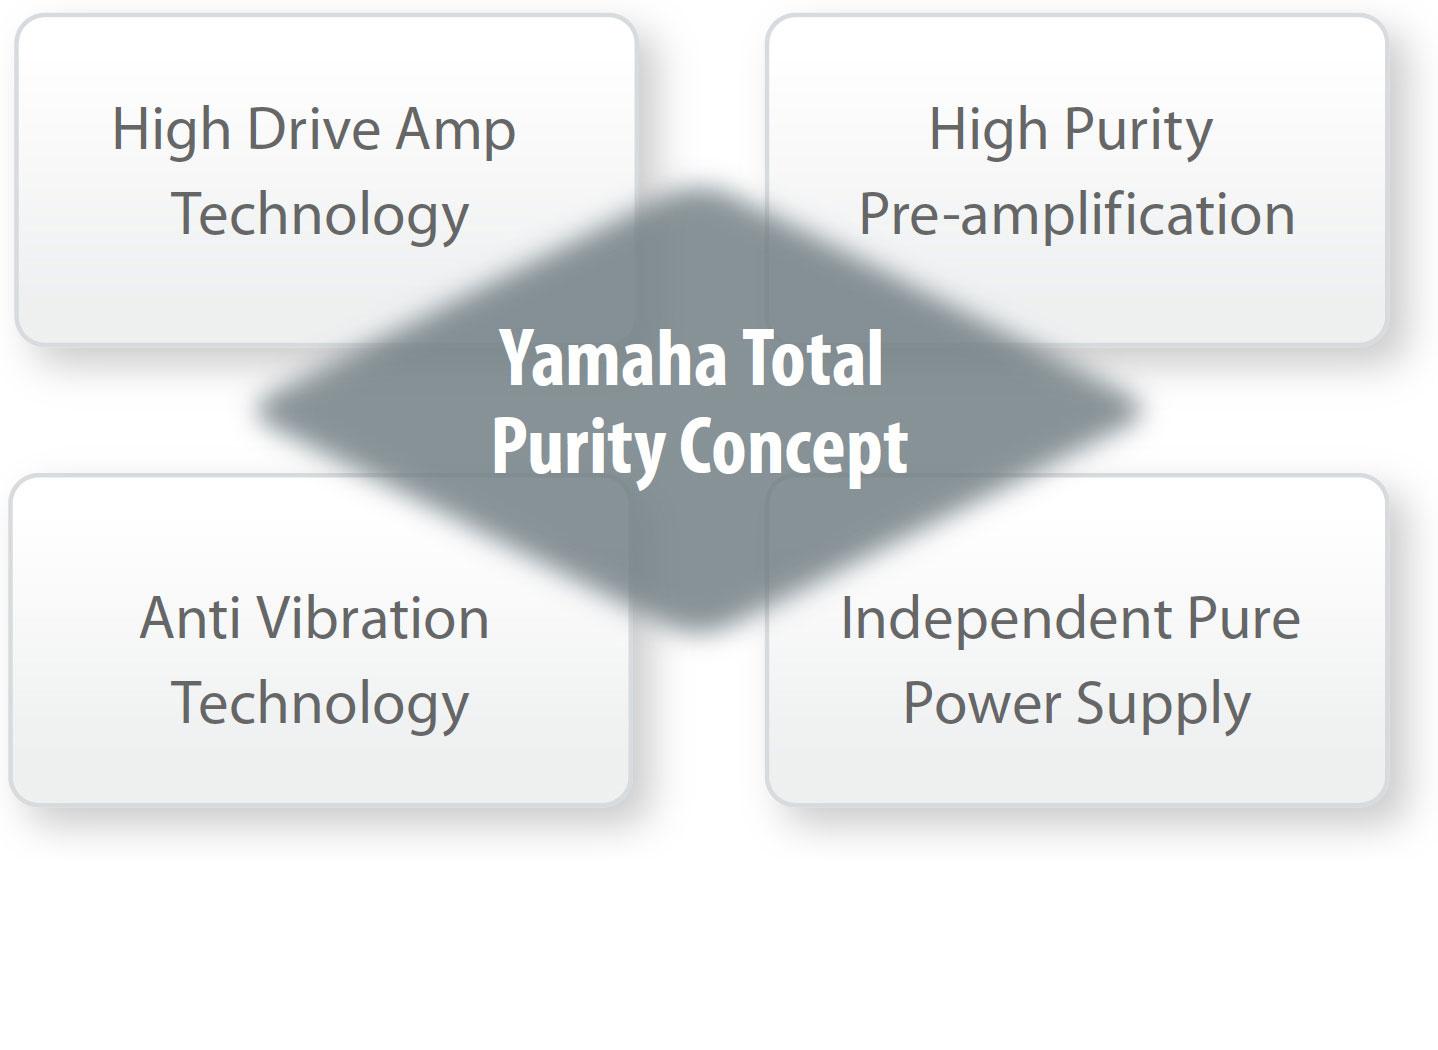 Total Purity koncepció a legfinomabb hangminőség